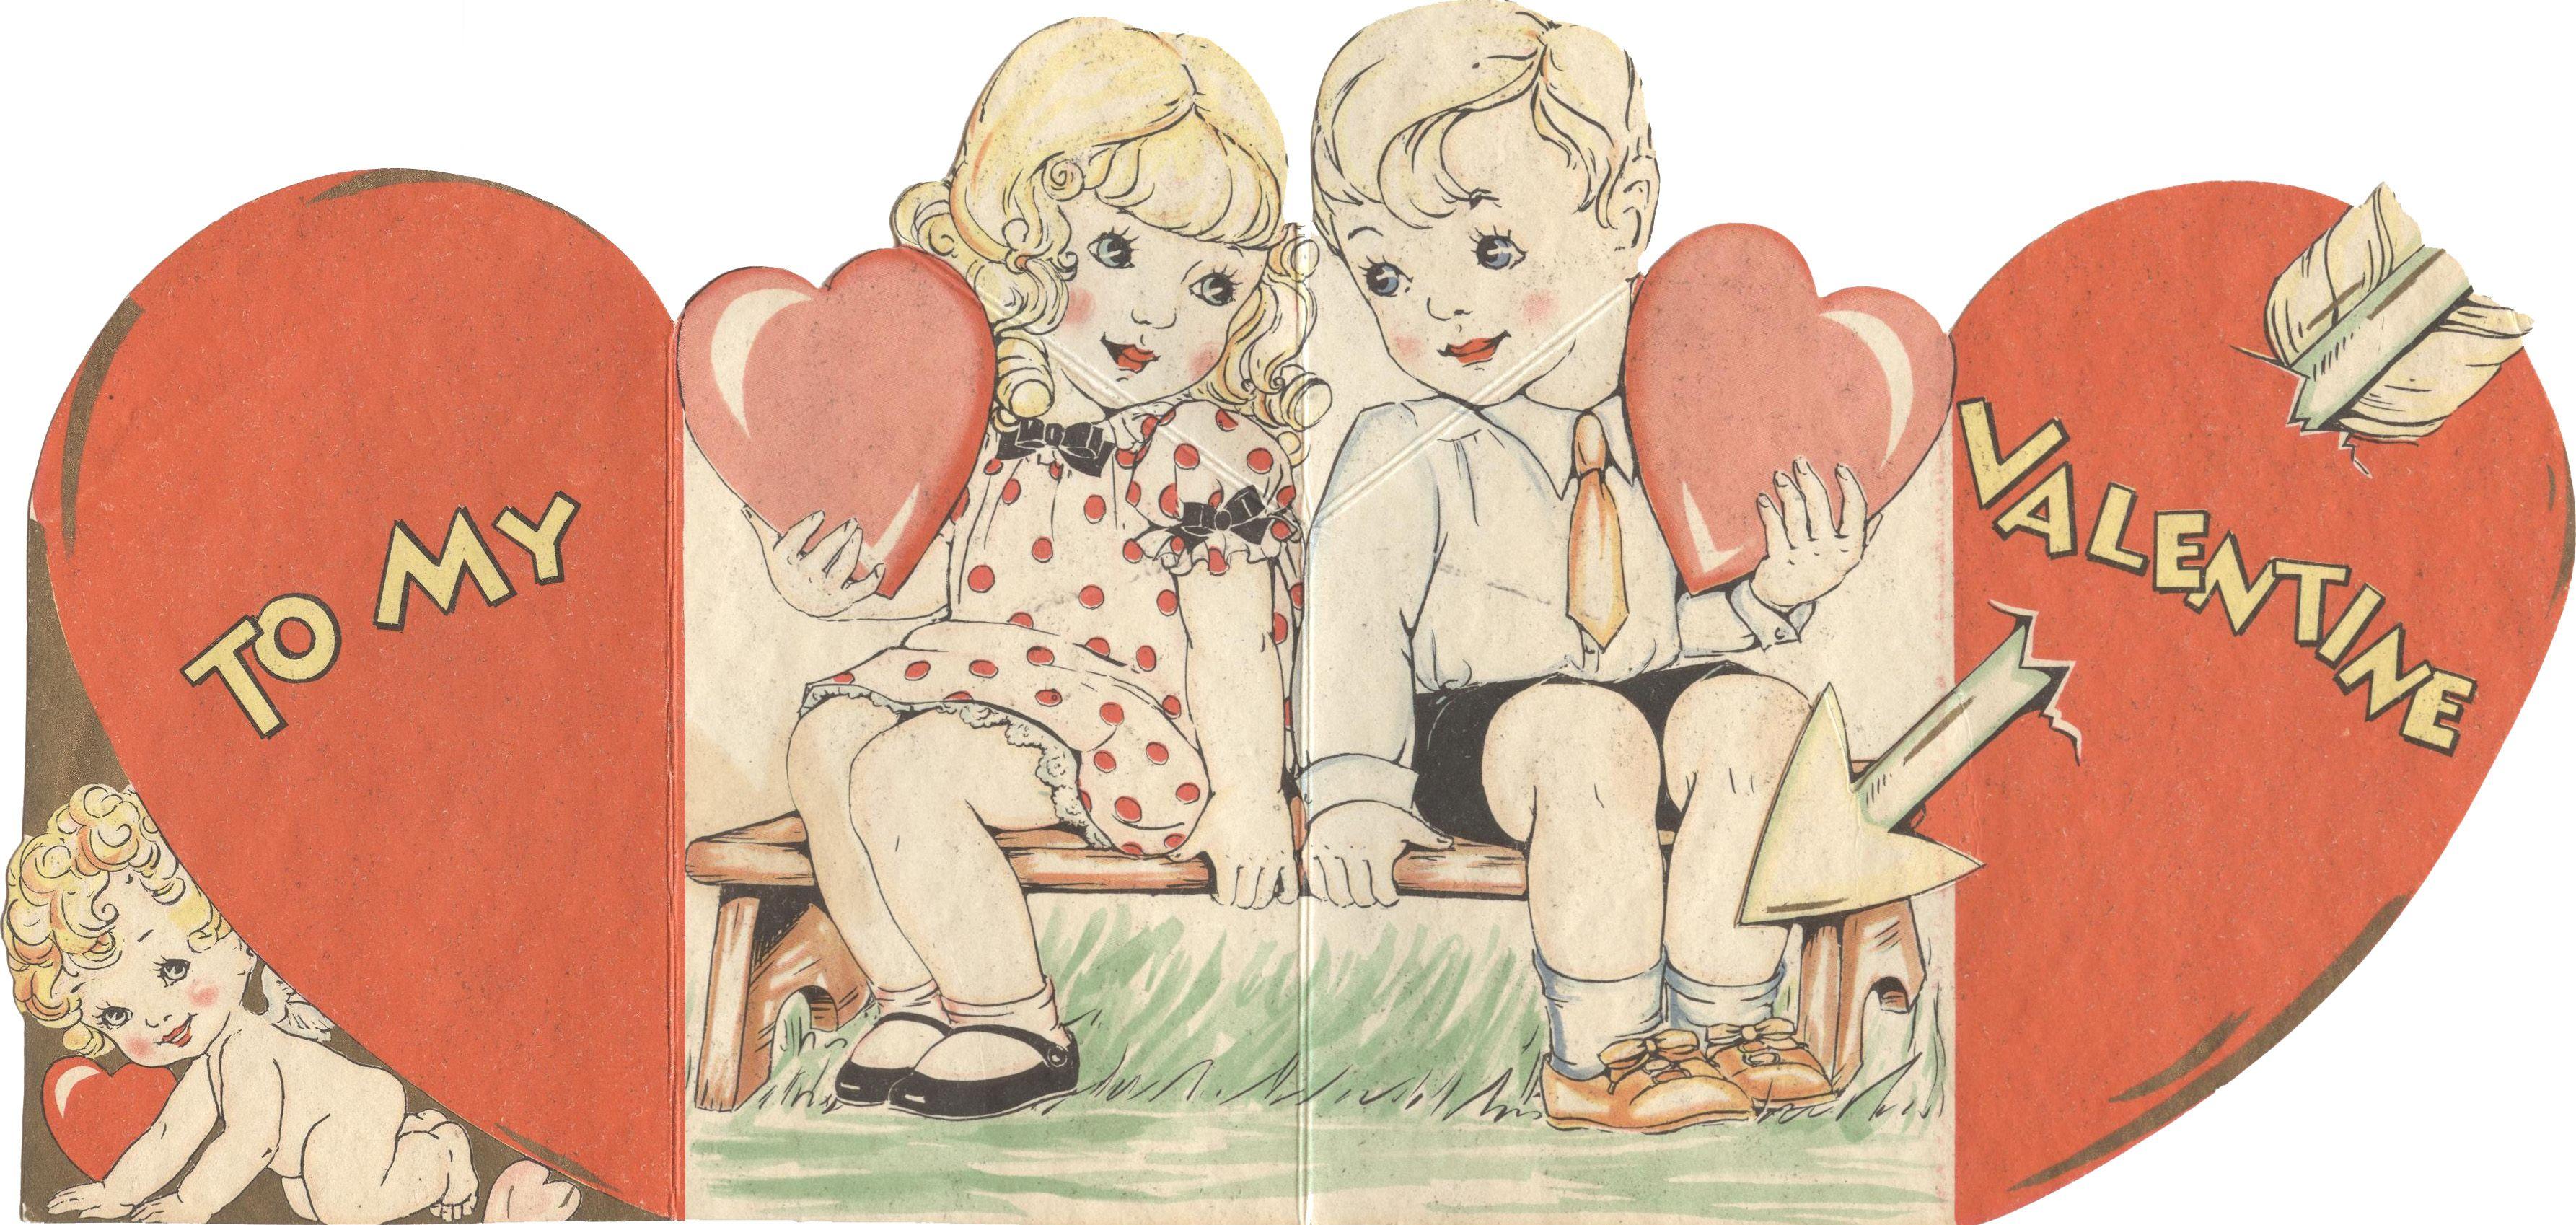 hallmark valentine cards quotes